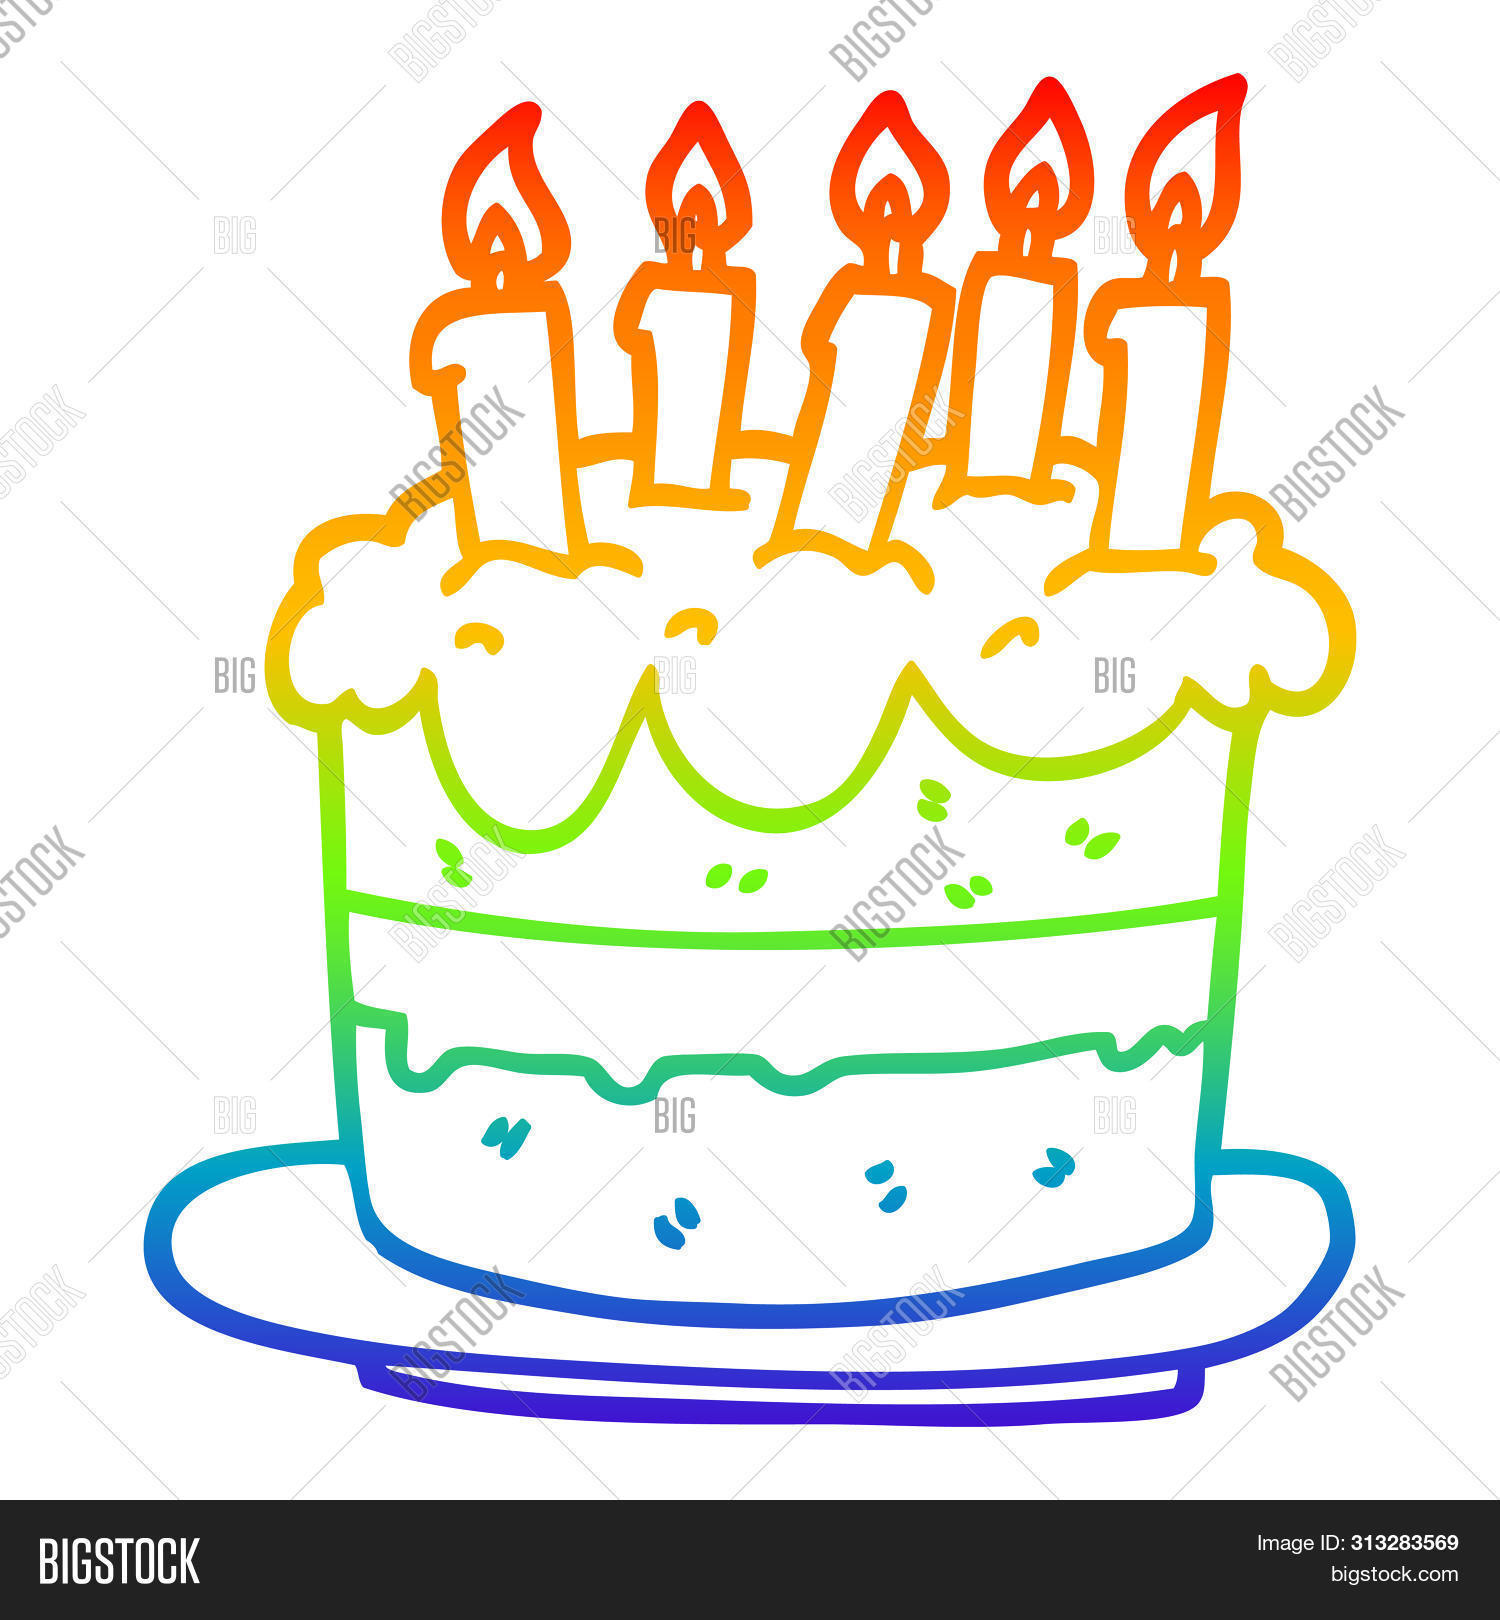 Excellent Rainbow Gradient Line Image Photo Free Trial Bigstock Personalised Birthday Cards Vishlily Jamesorg